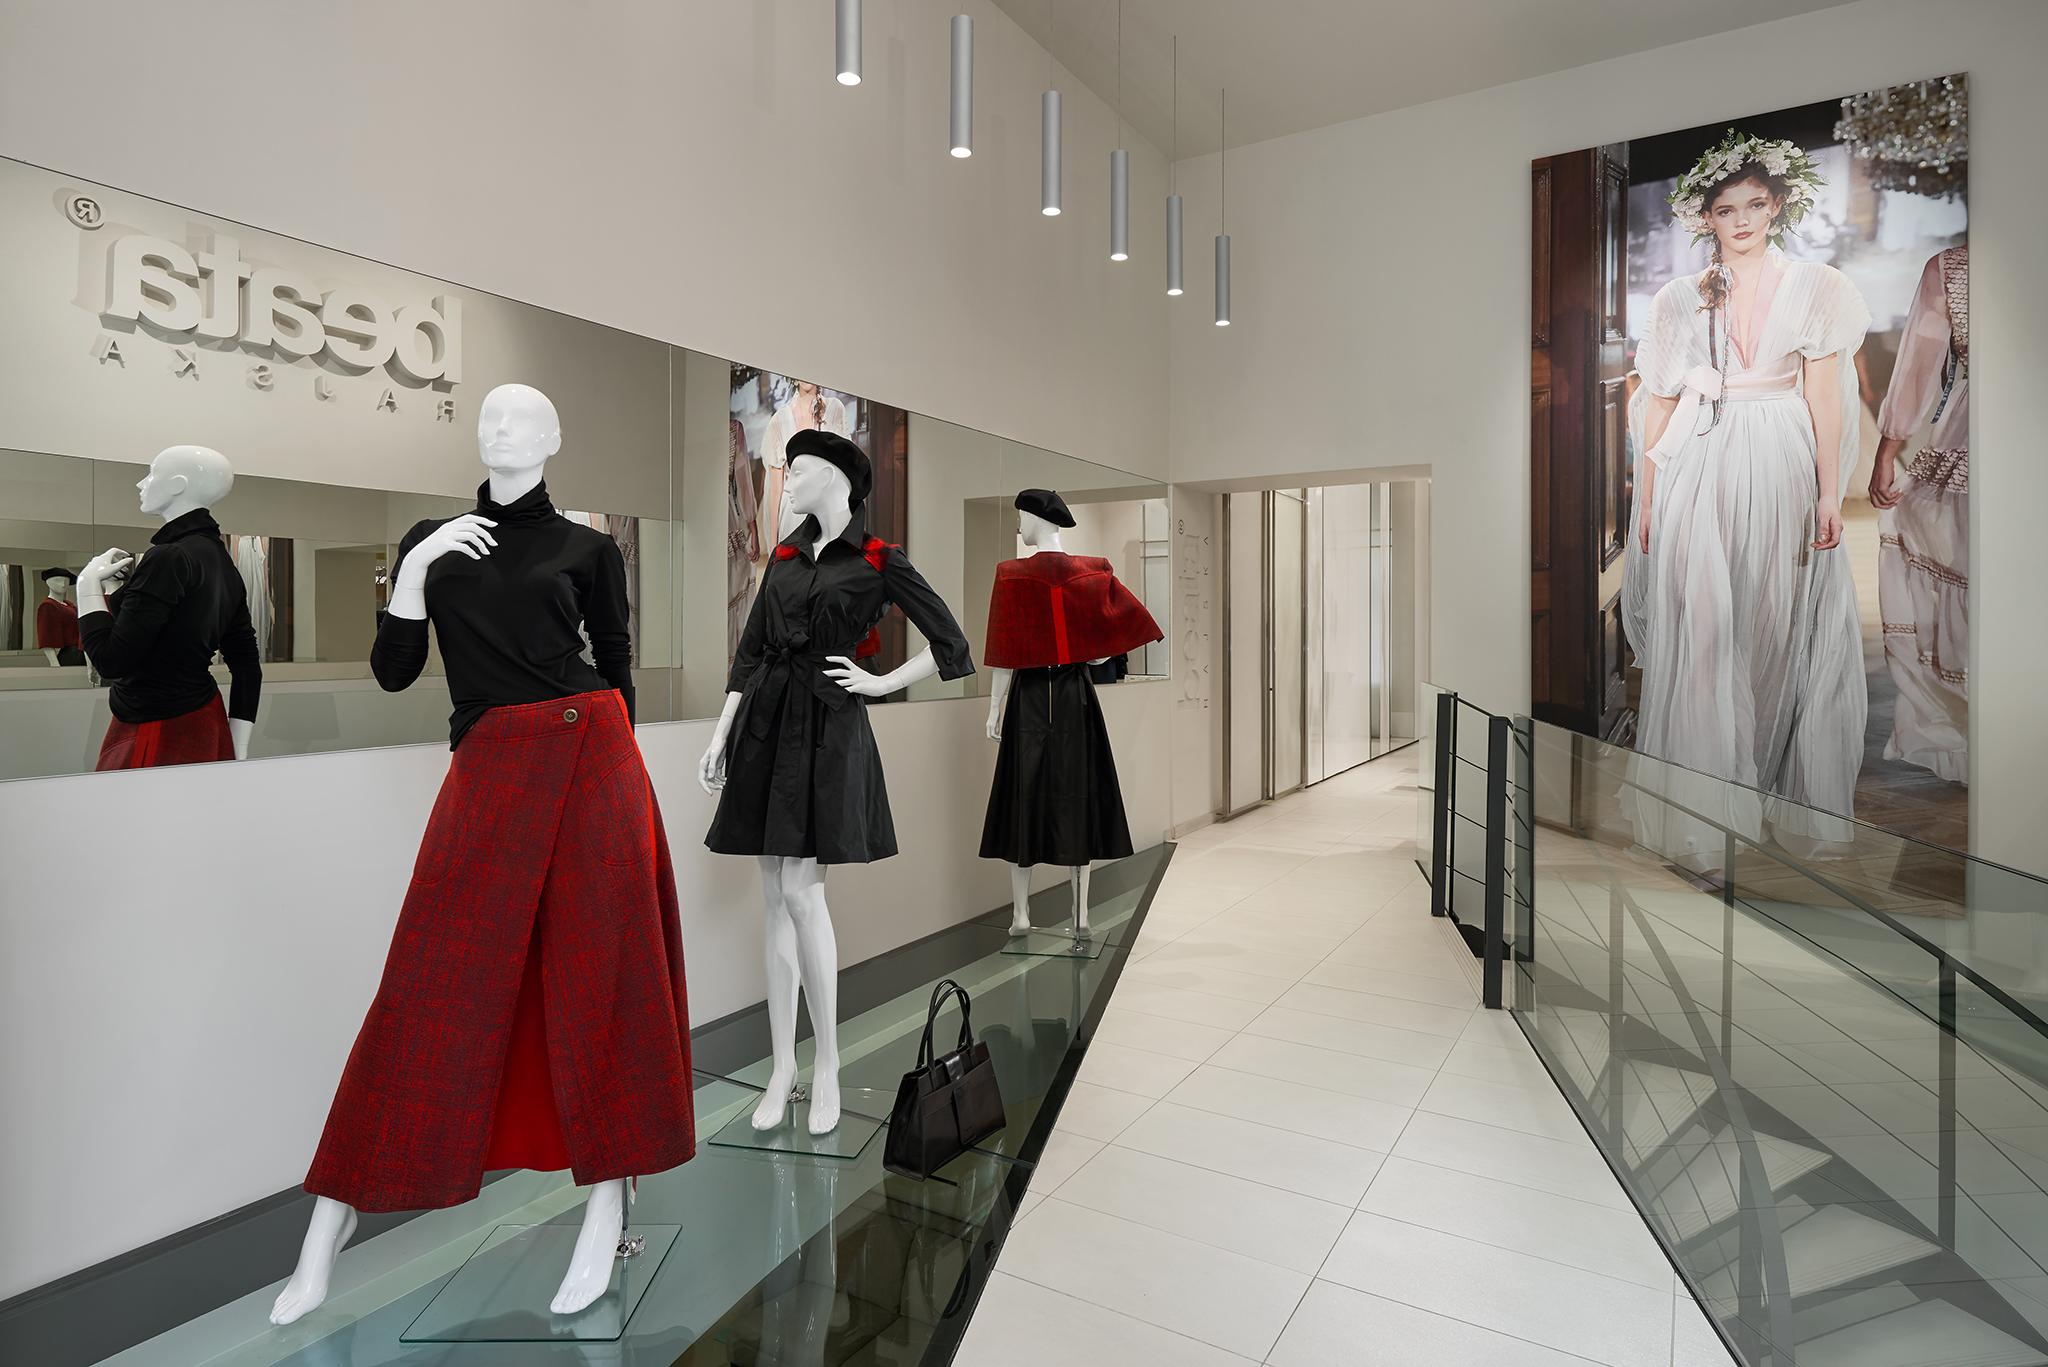 At fashion designer's